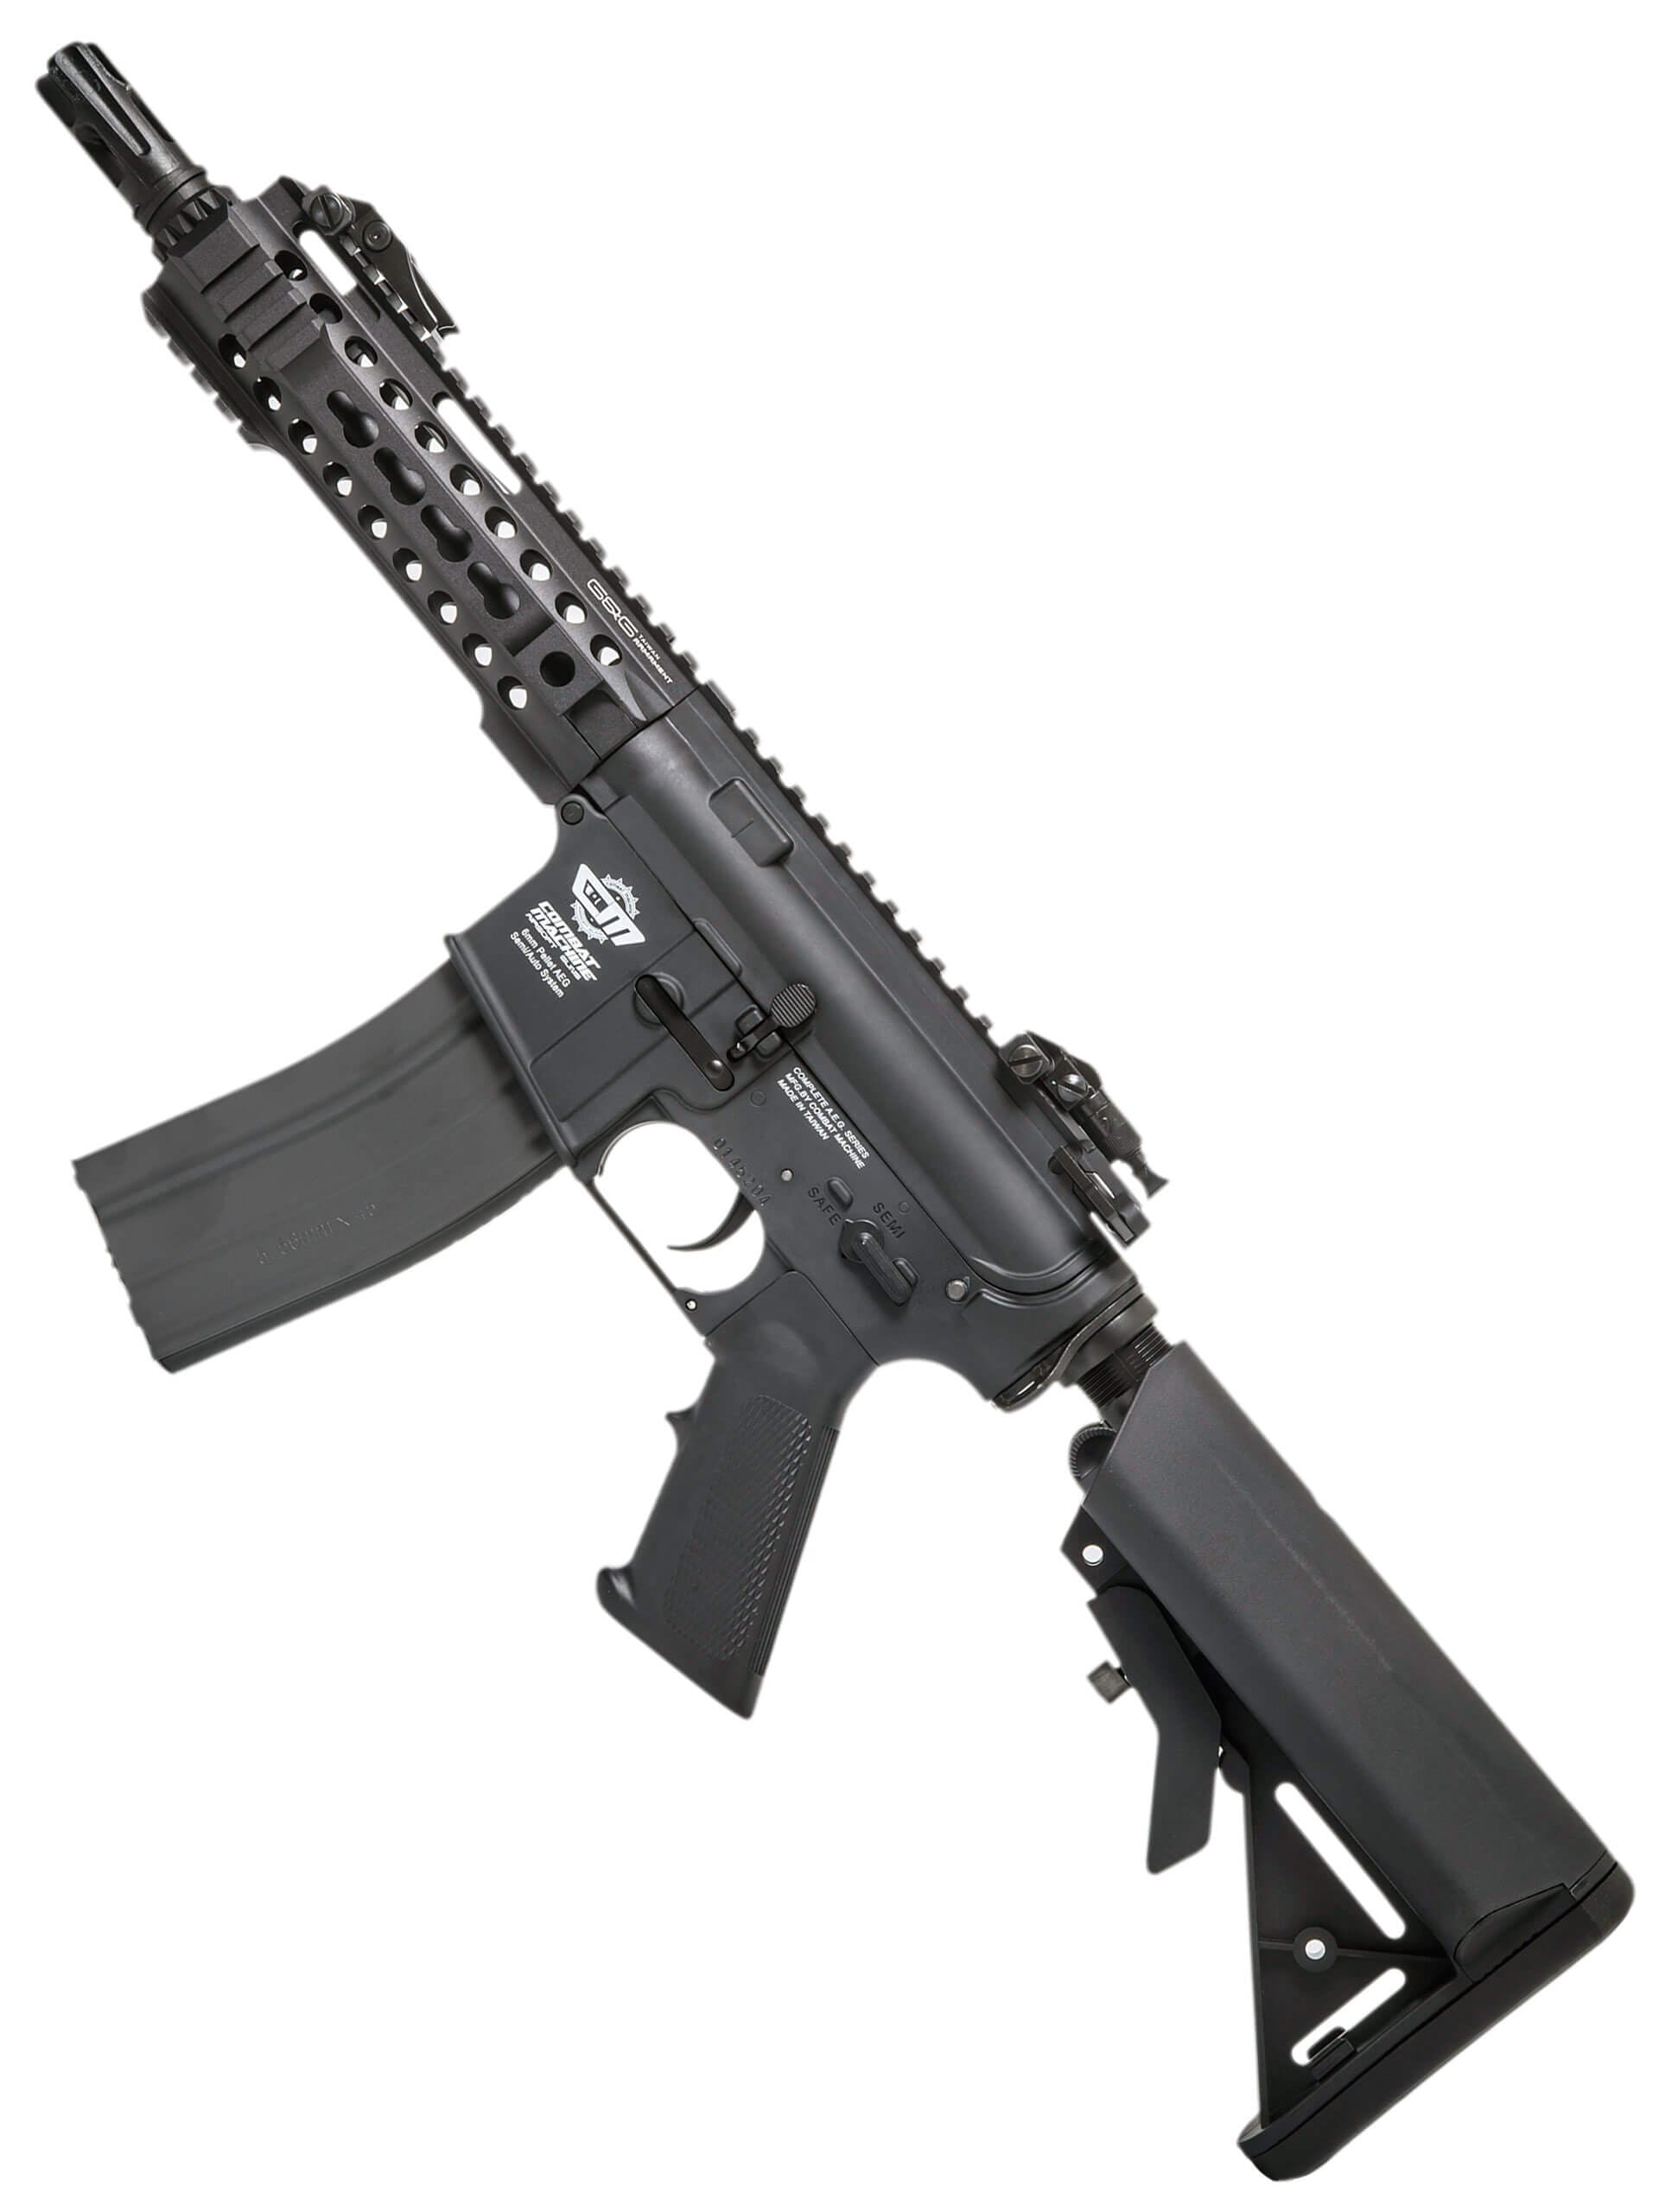 & Armament - Combat Machine Cm16 300bot